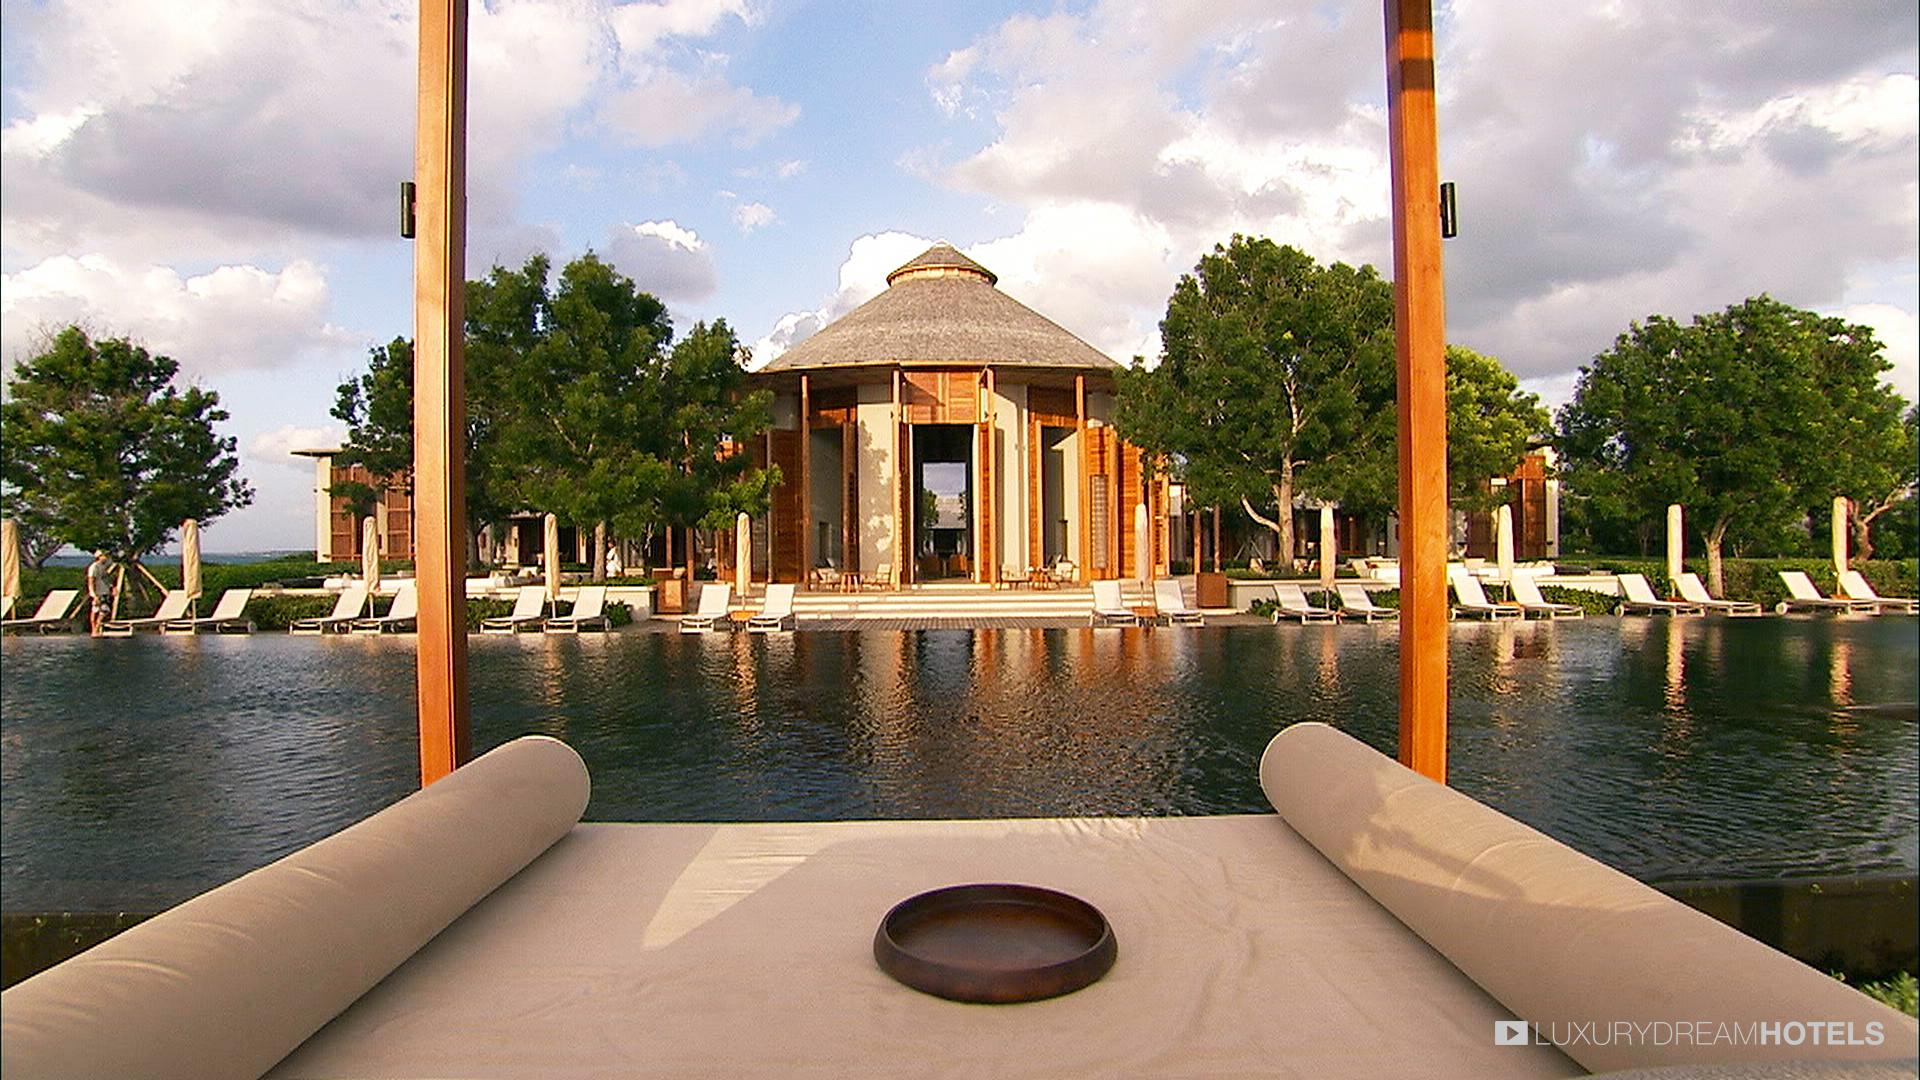 Luxury hotel, Amanyara, Turks and Caicos Islands, Turks And Caicos ...